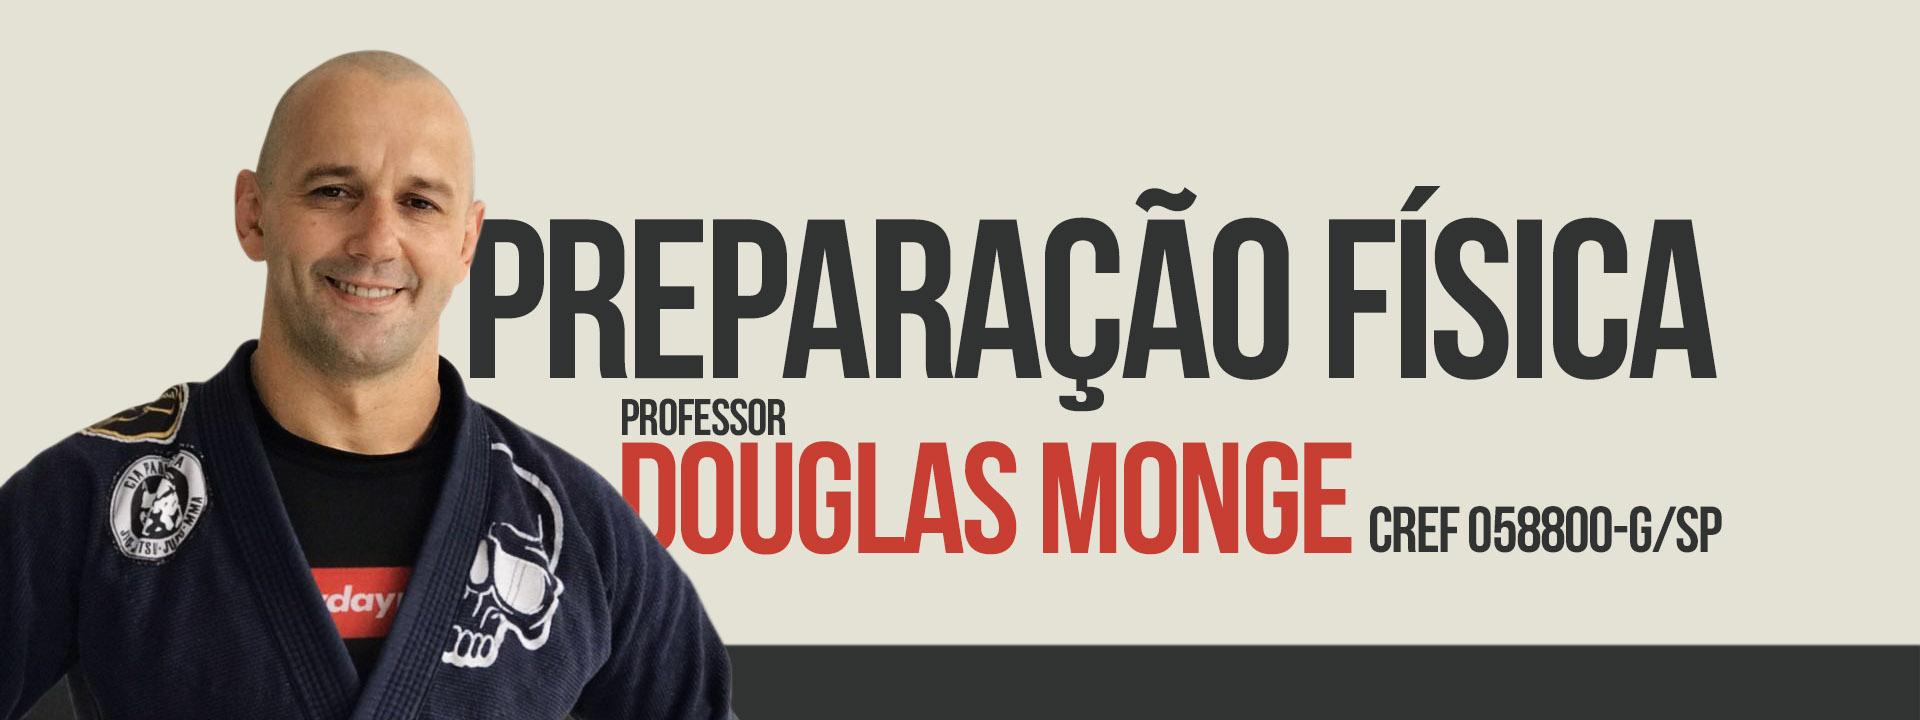 Banner Douglas Monge